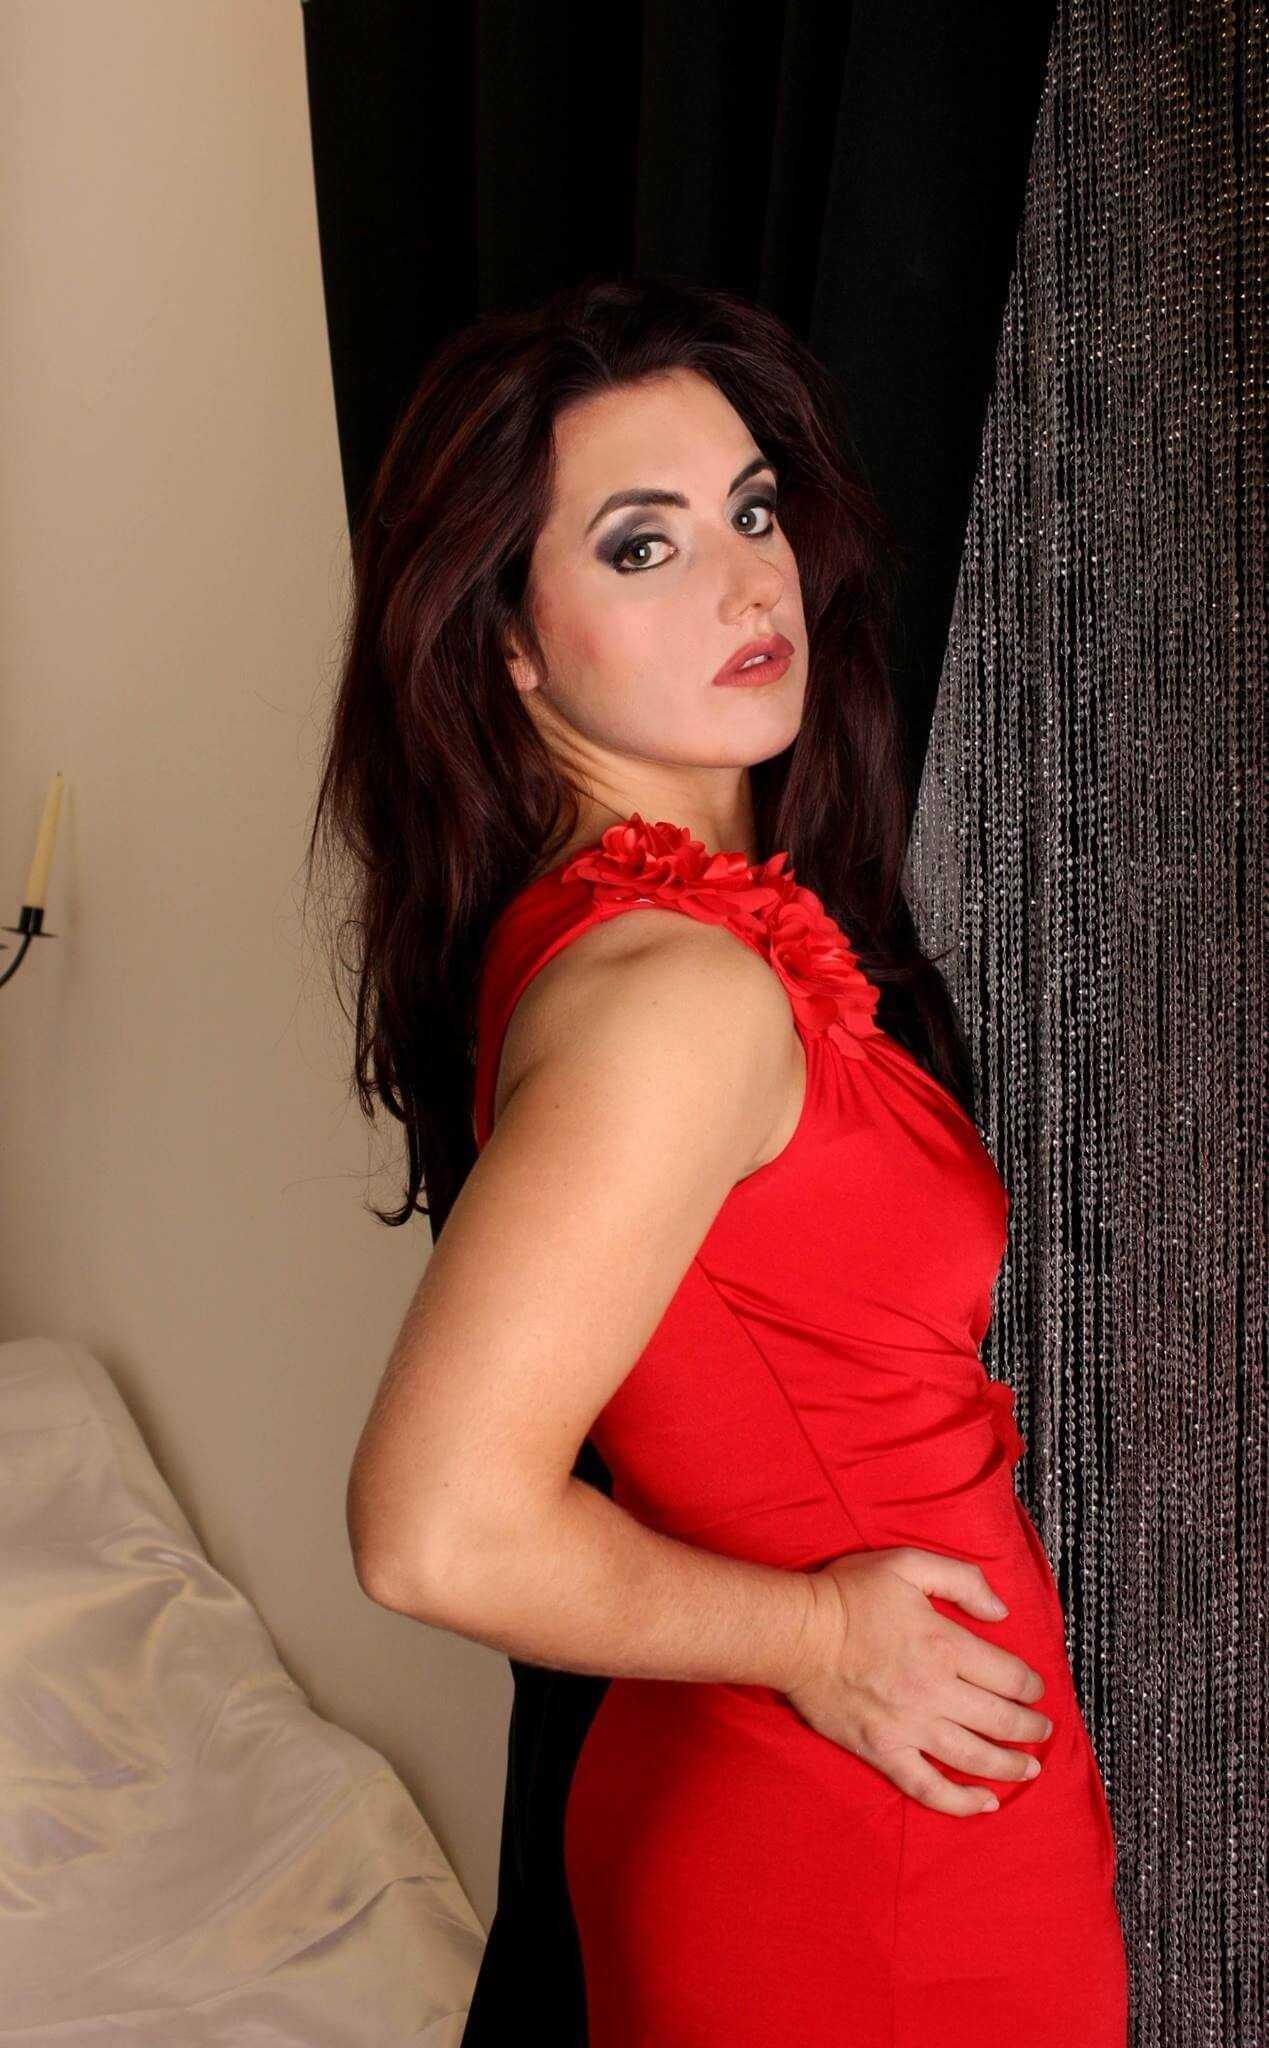 Nikki-Cross-sexy-red-dress